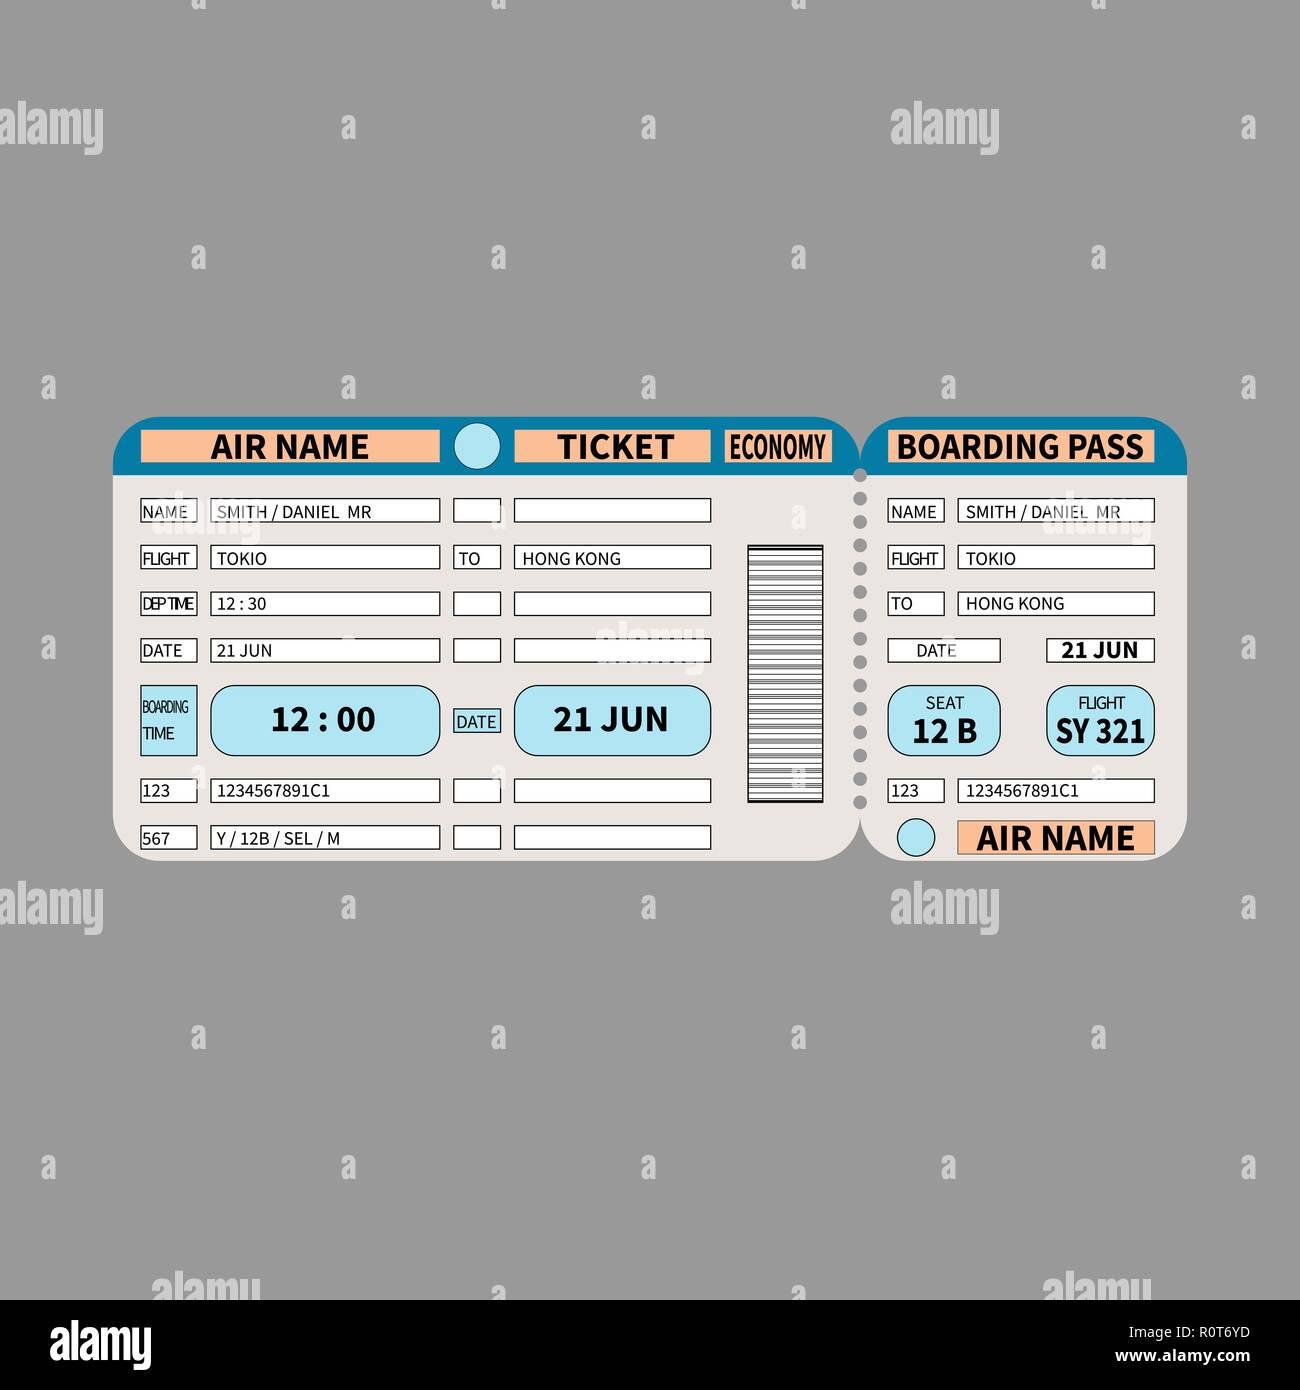 Boarding Pass Barcode Stock Photos Boarding Pass Barcode Stock